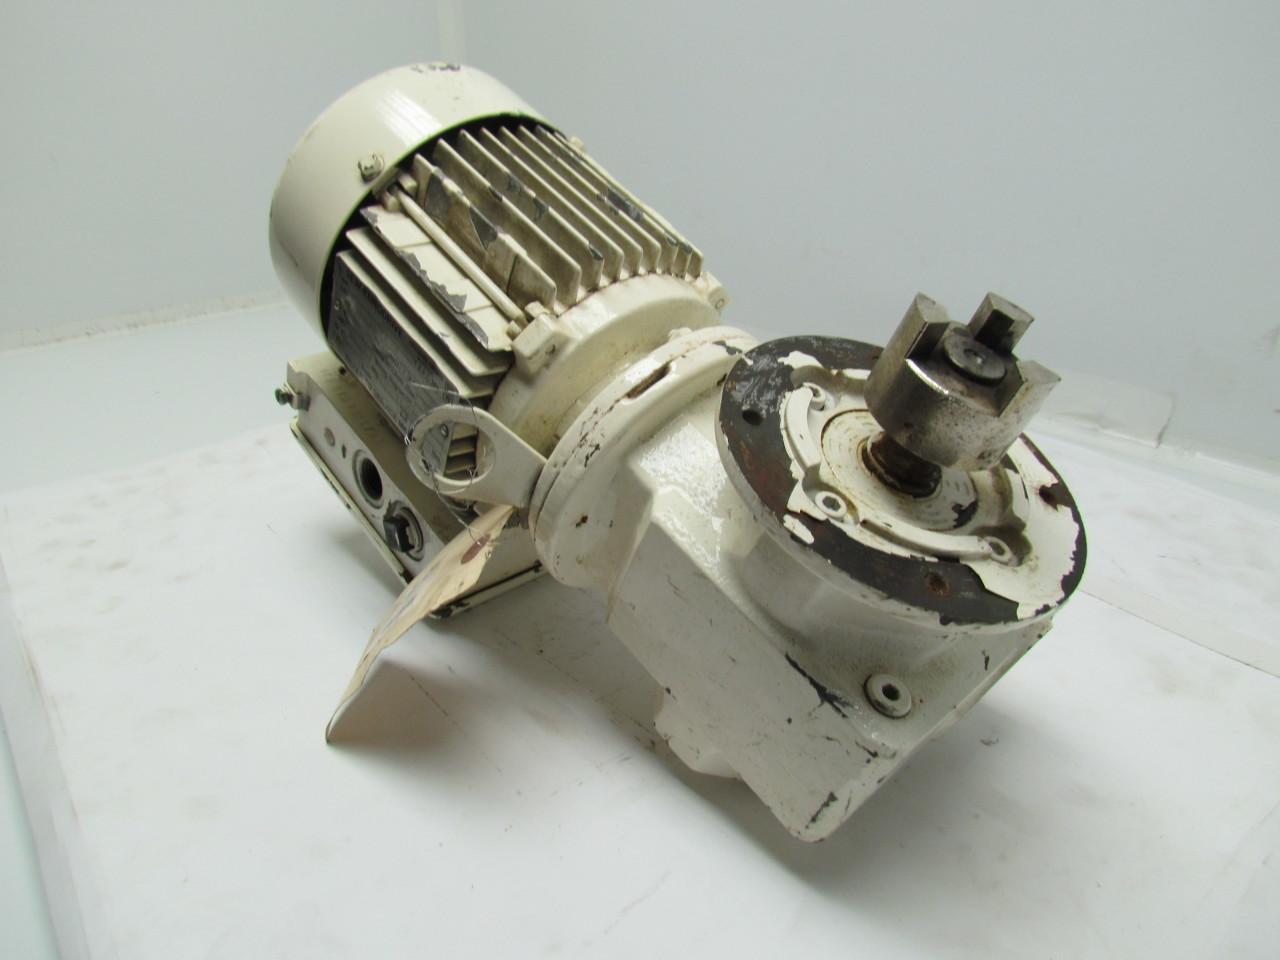 Sew Eurodrive Sf32dt71c4 15 1 Ratio Motor Gearbox